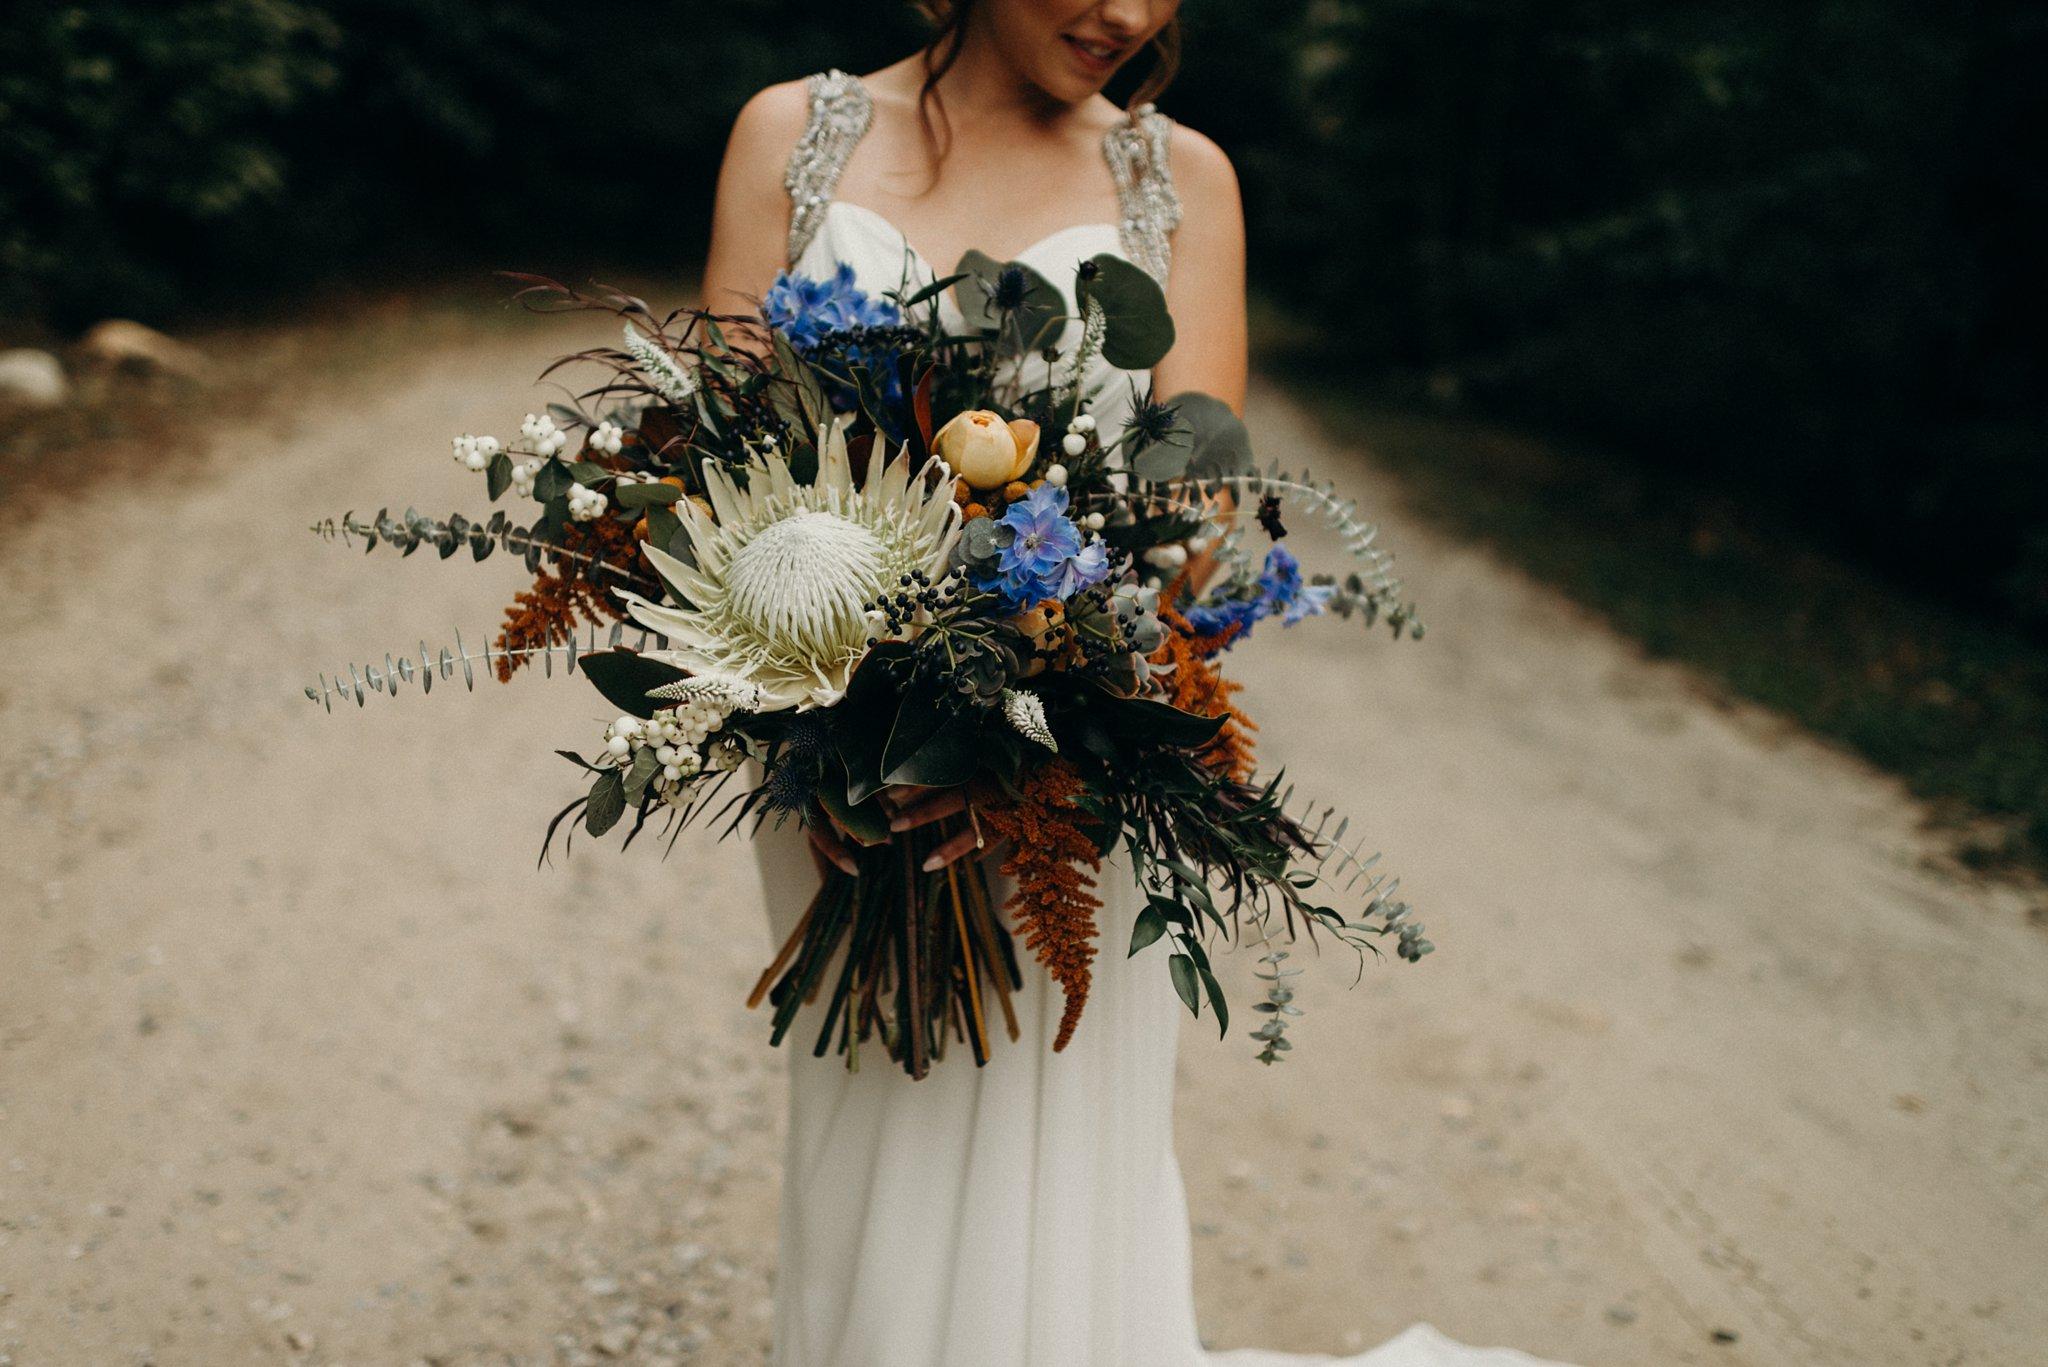 kaihla_tonai_intimate_wedding_elopement_photographer_6595.jpg